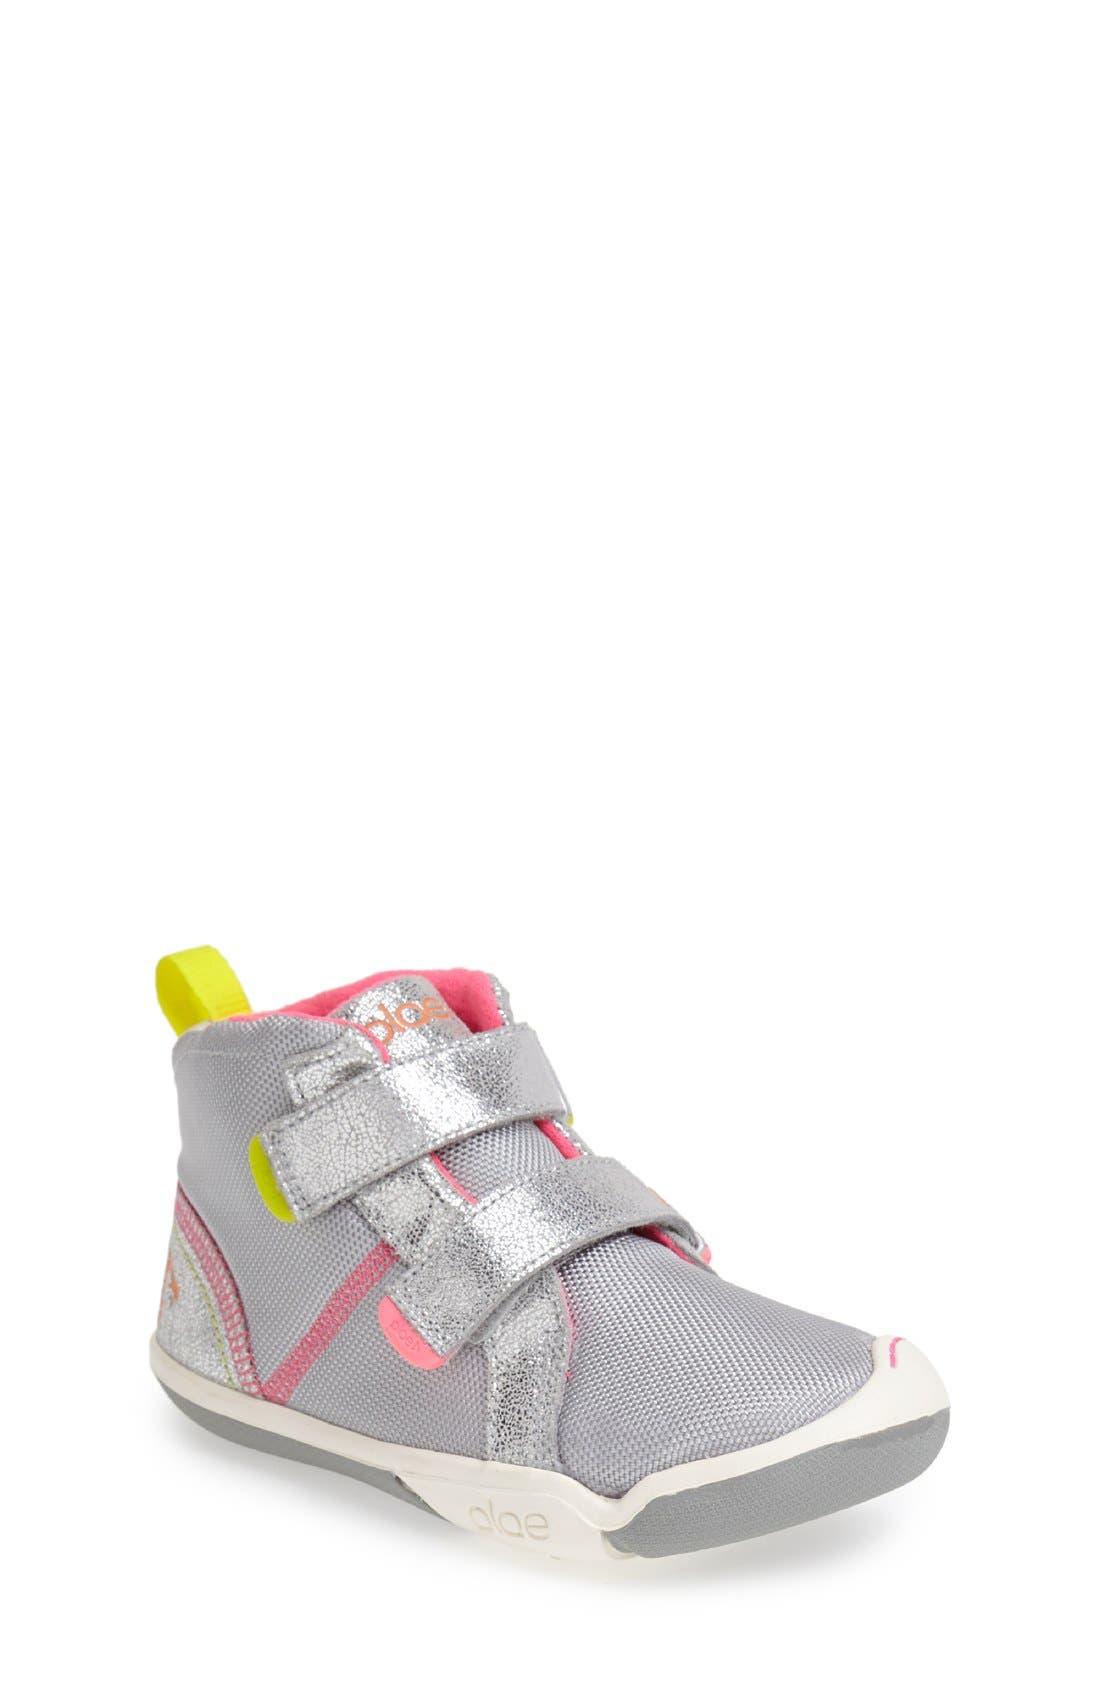 'Max' Customizable High Top Sneaker,                             Main thumbnail 1, color,                             040